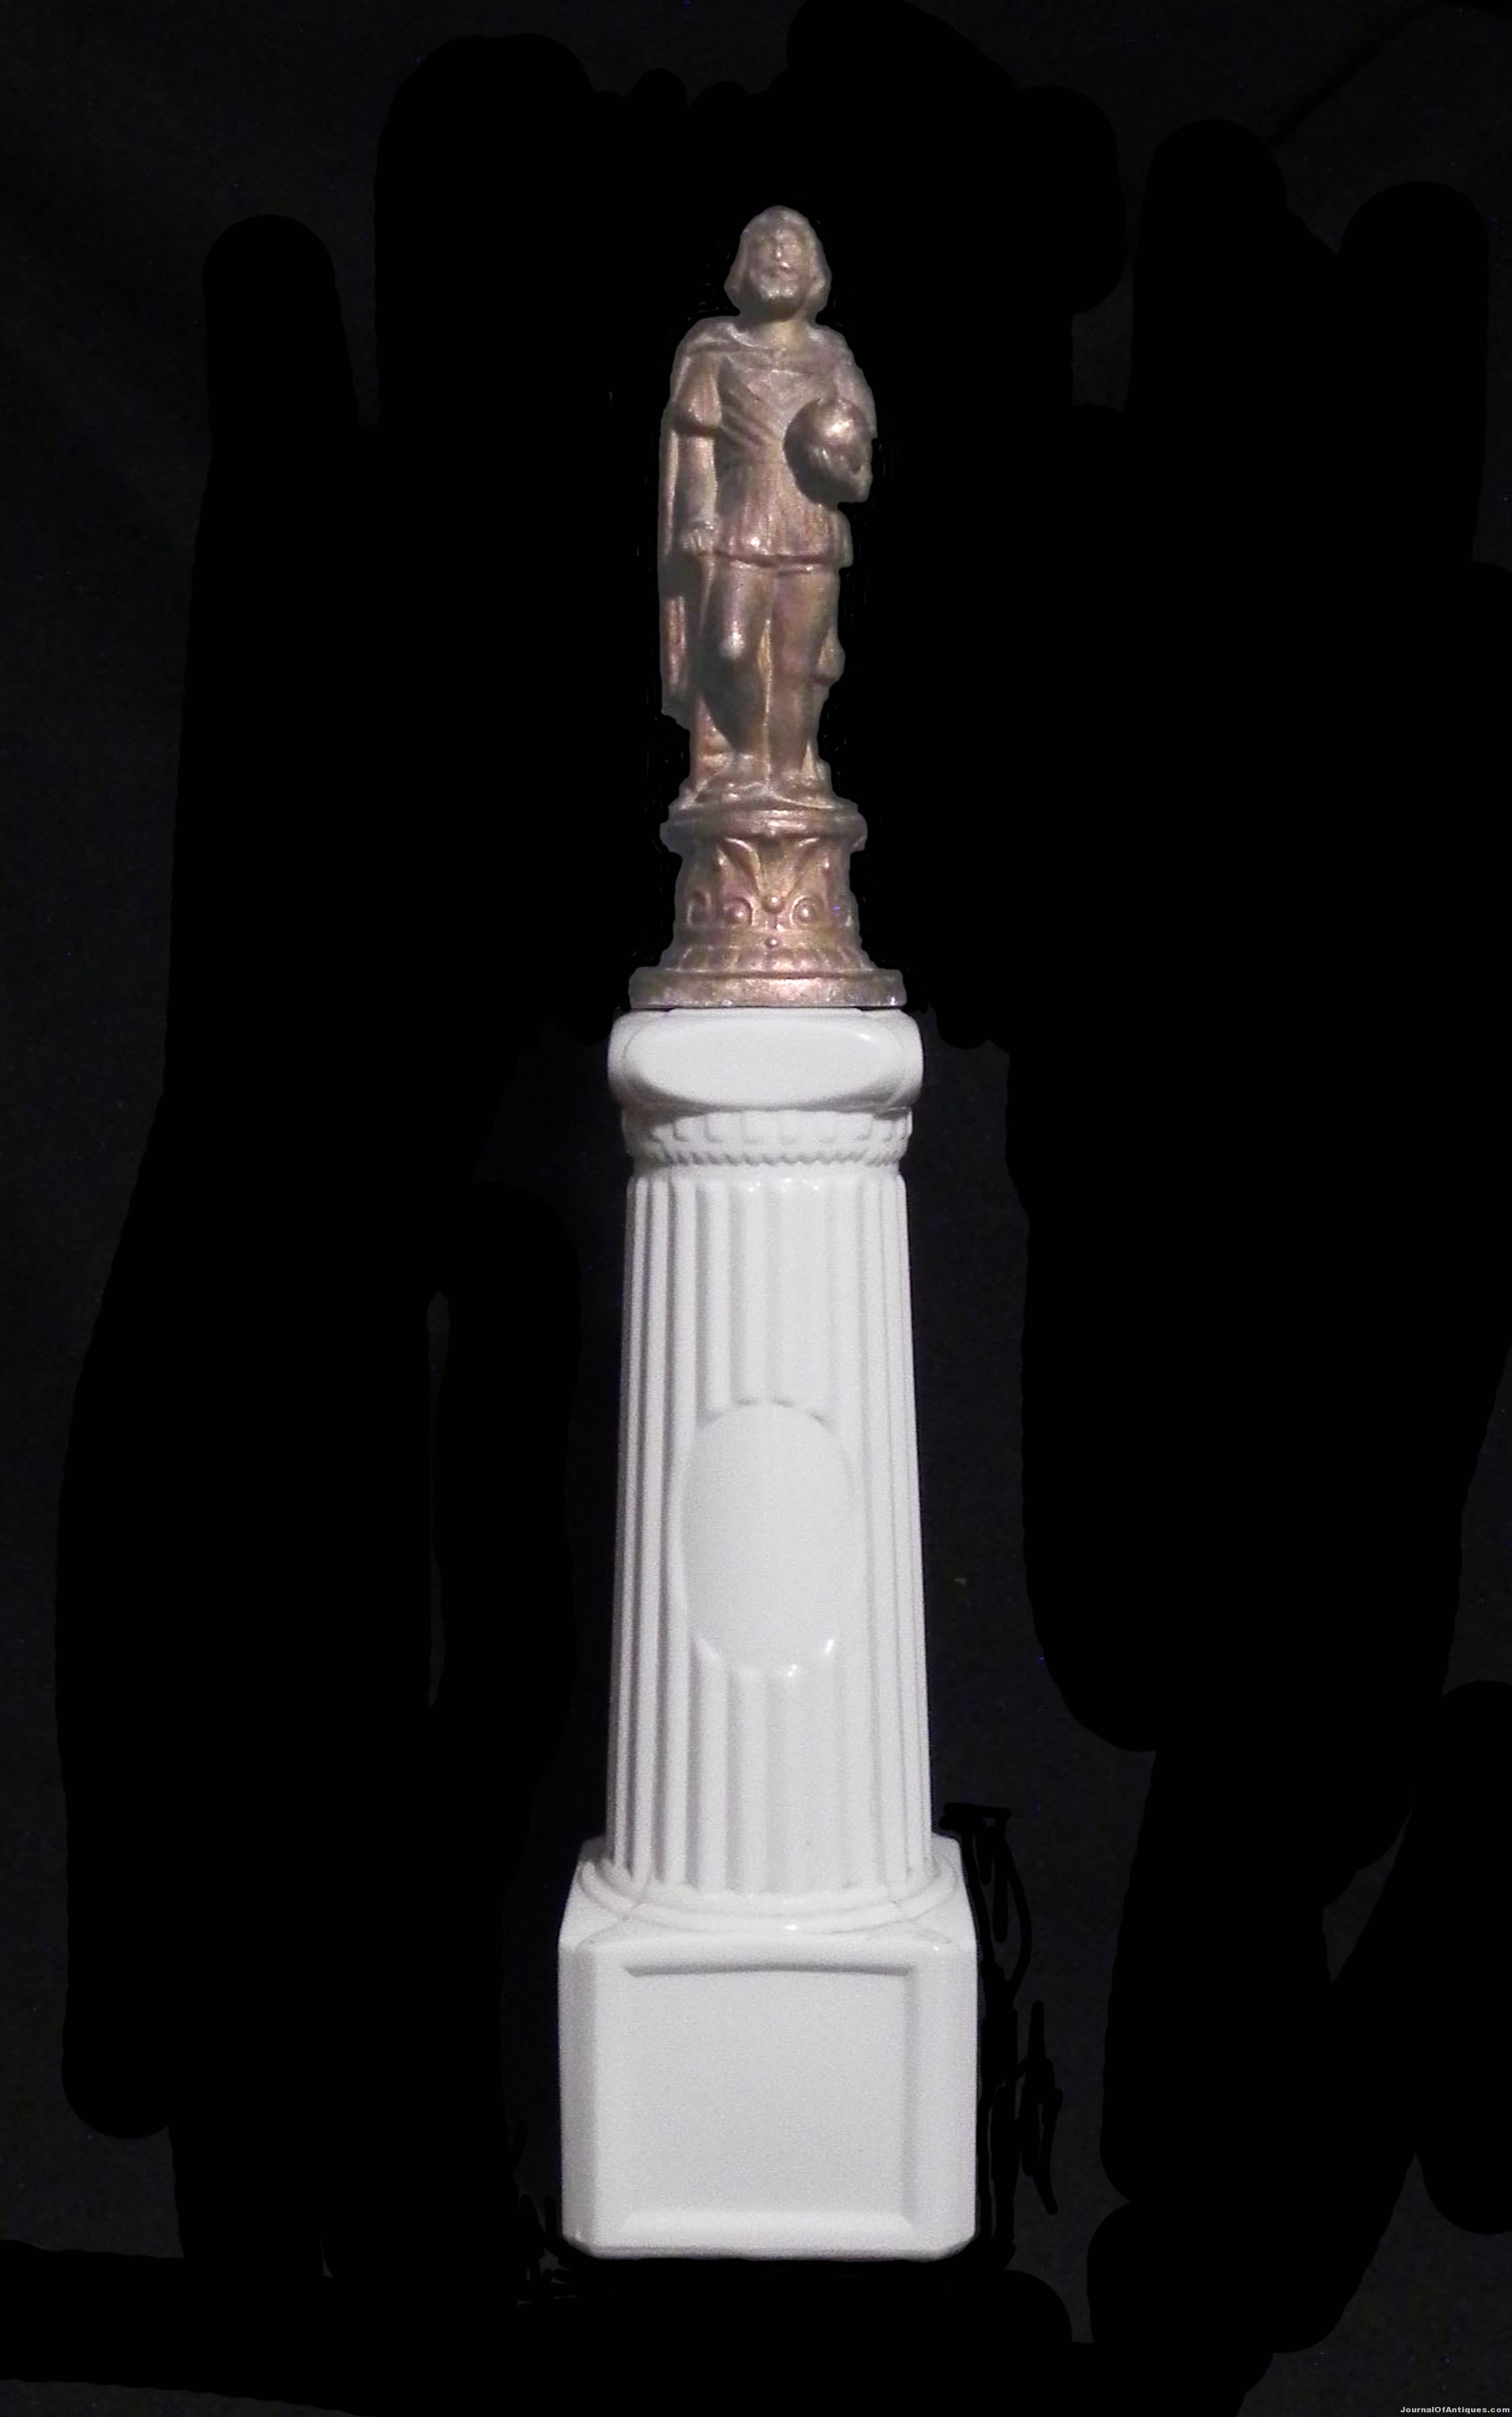 Statue of Columbus Bottle